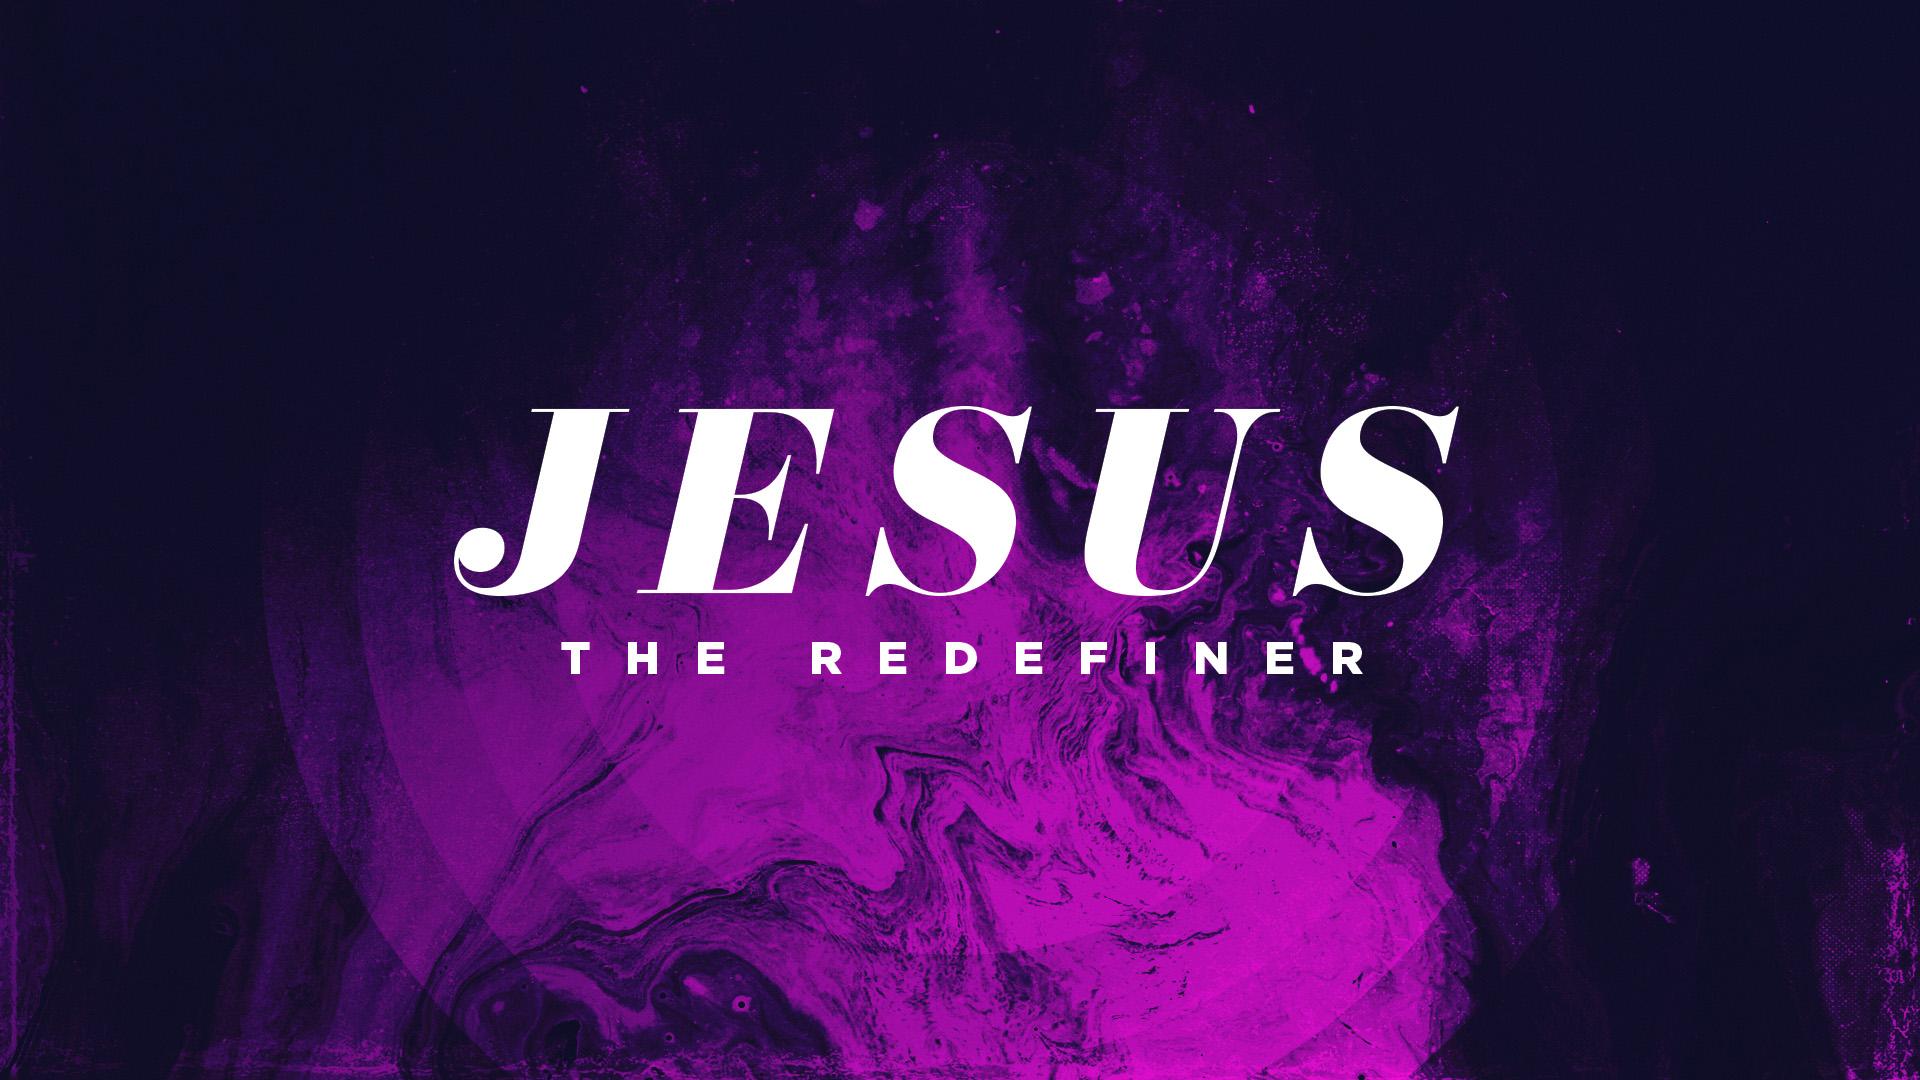 Jesus the Redefiner